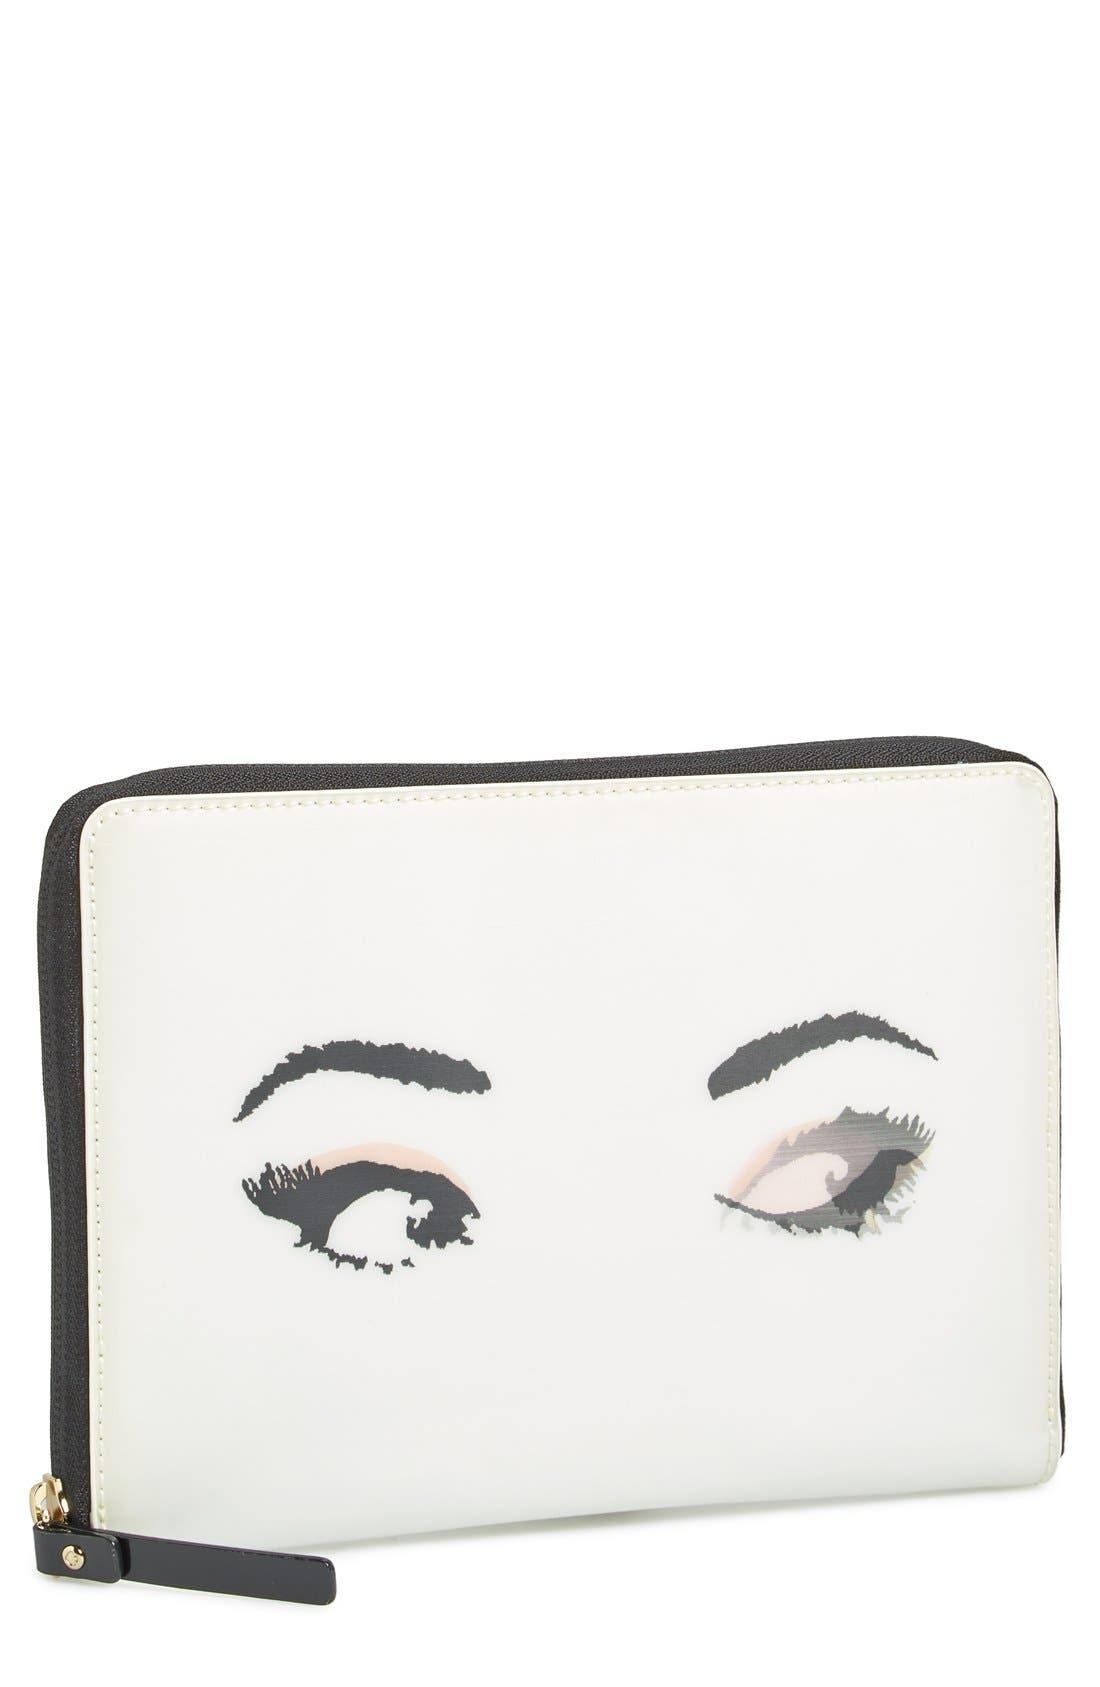 Main Image - kate spade new york 'lenticular eyes' iPad mini sleeve